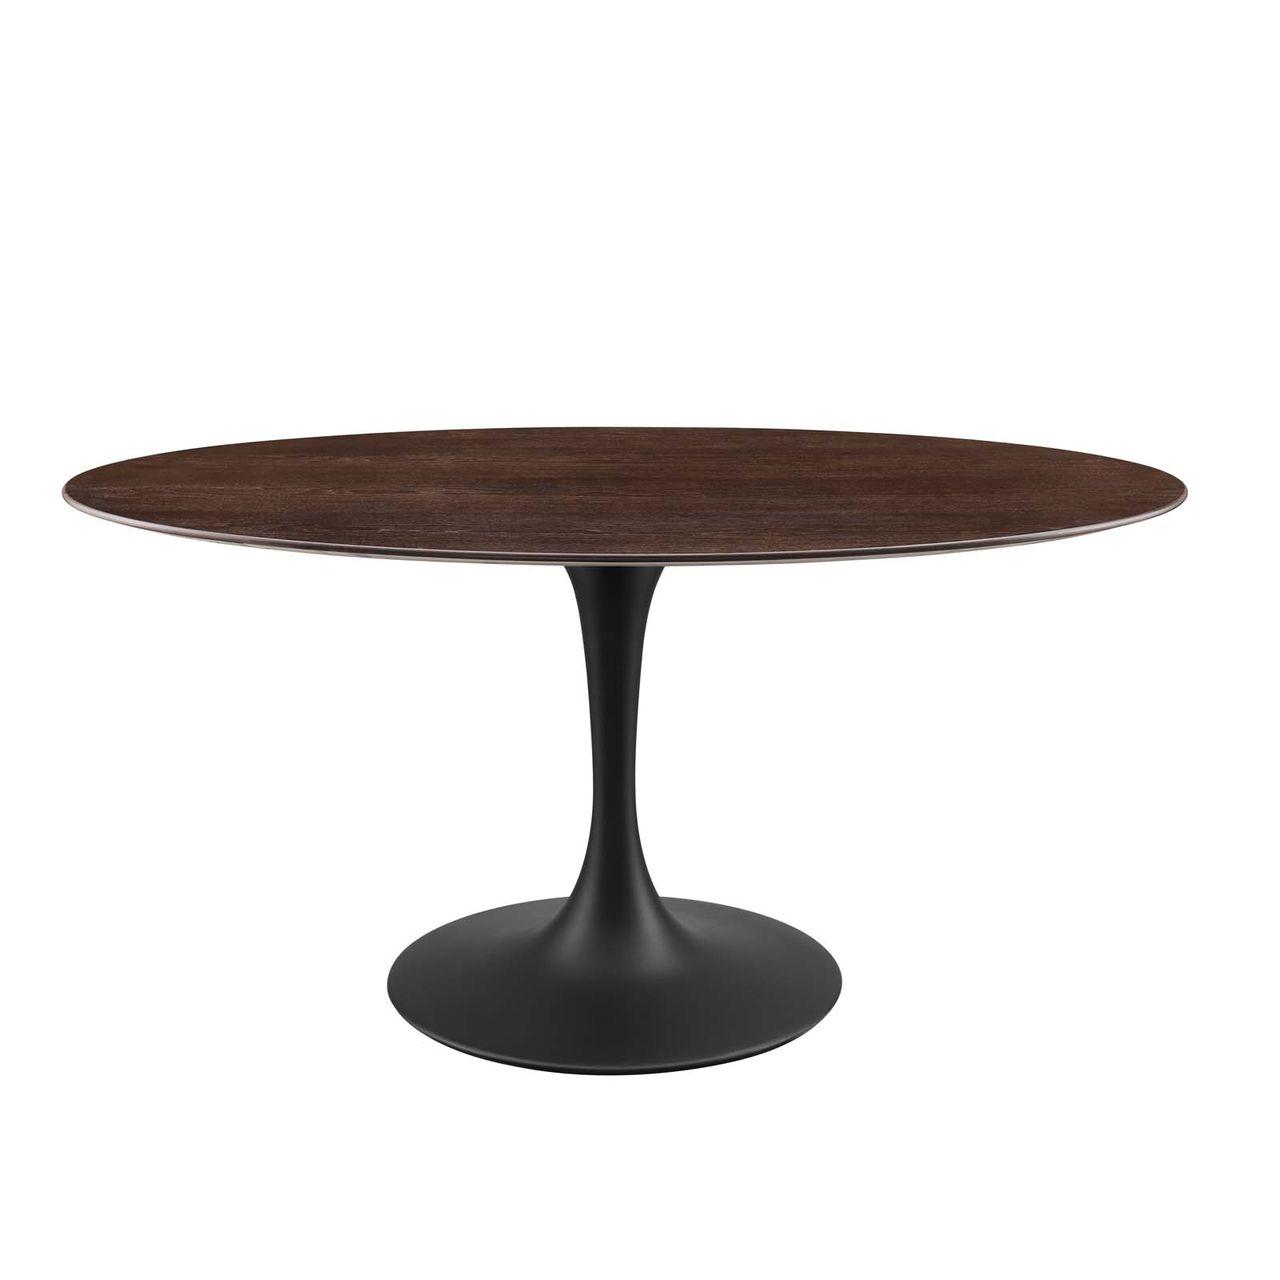 "Modway Lippa 60"" Wood Oval Dining Table - Black Cherry Walnut"